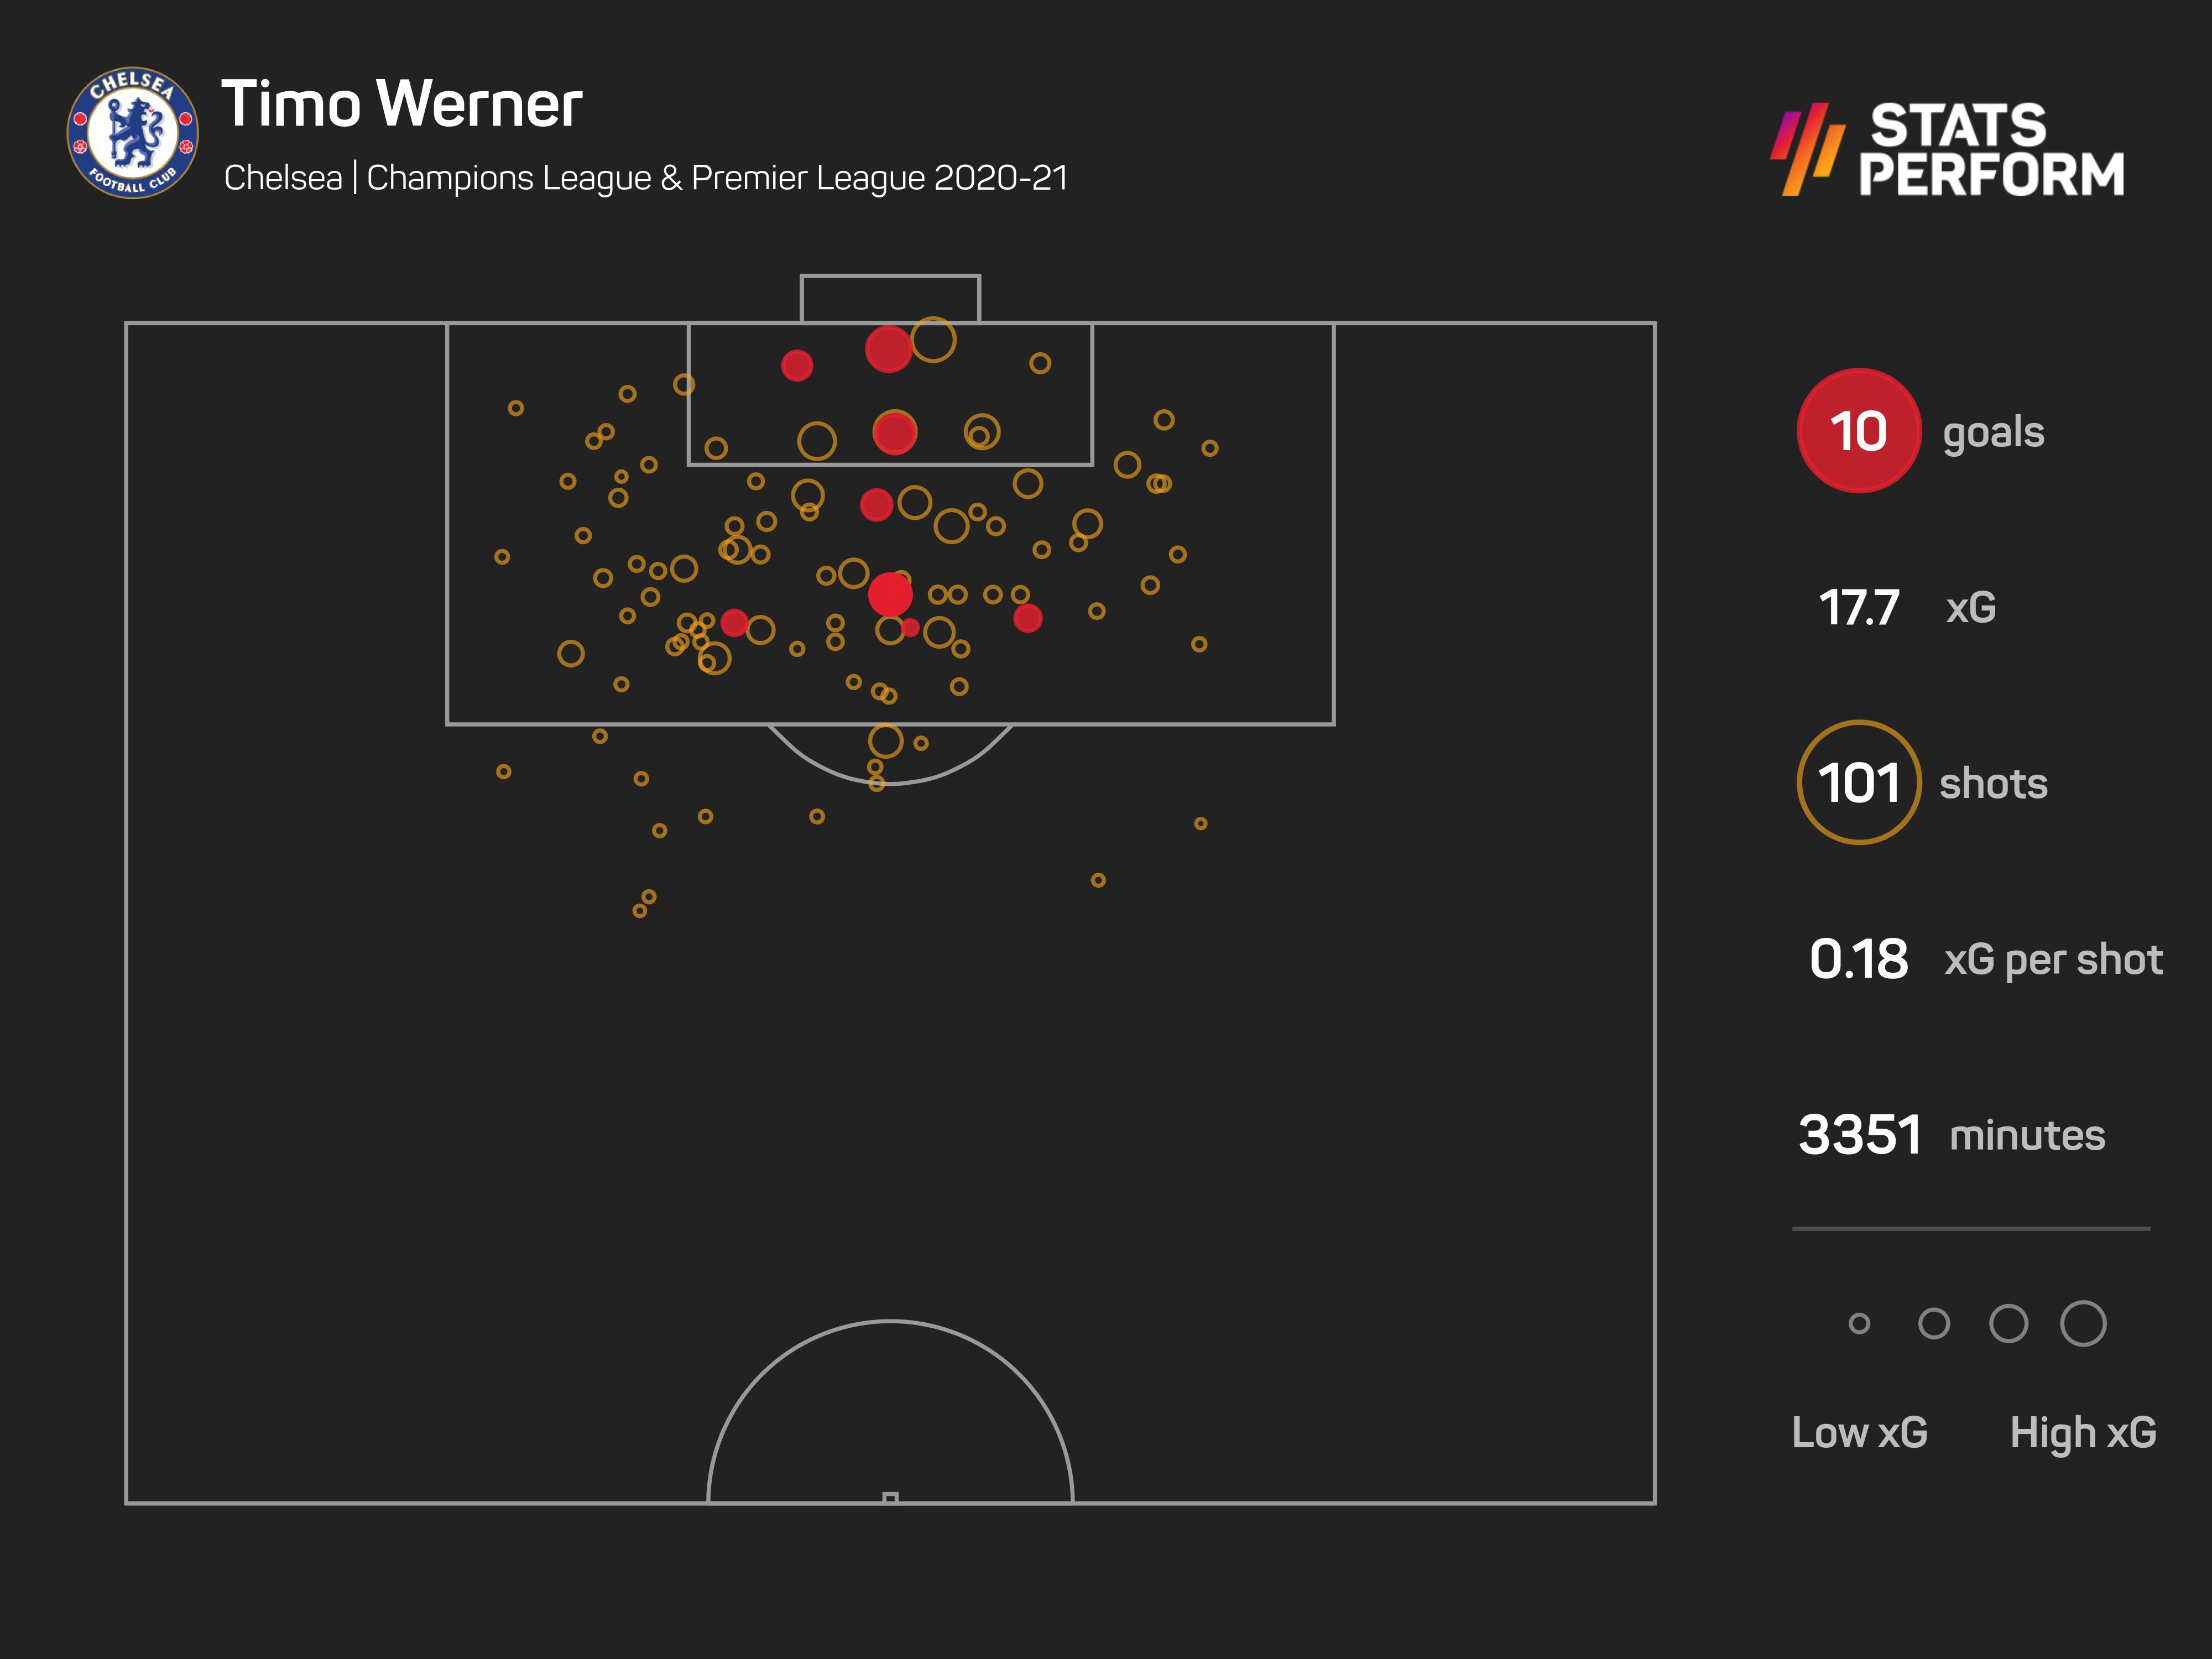 Timo Werner 2020-21